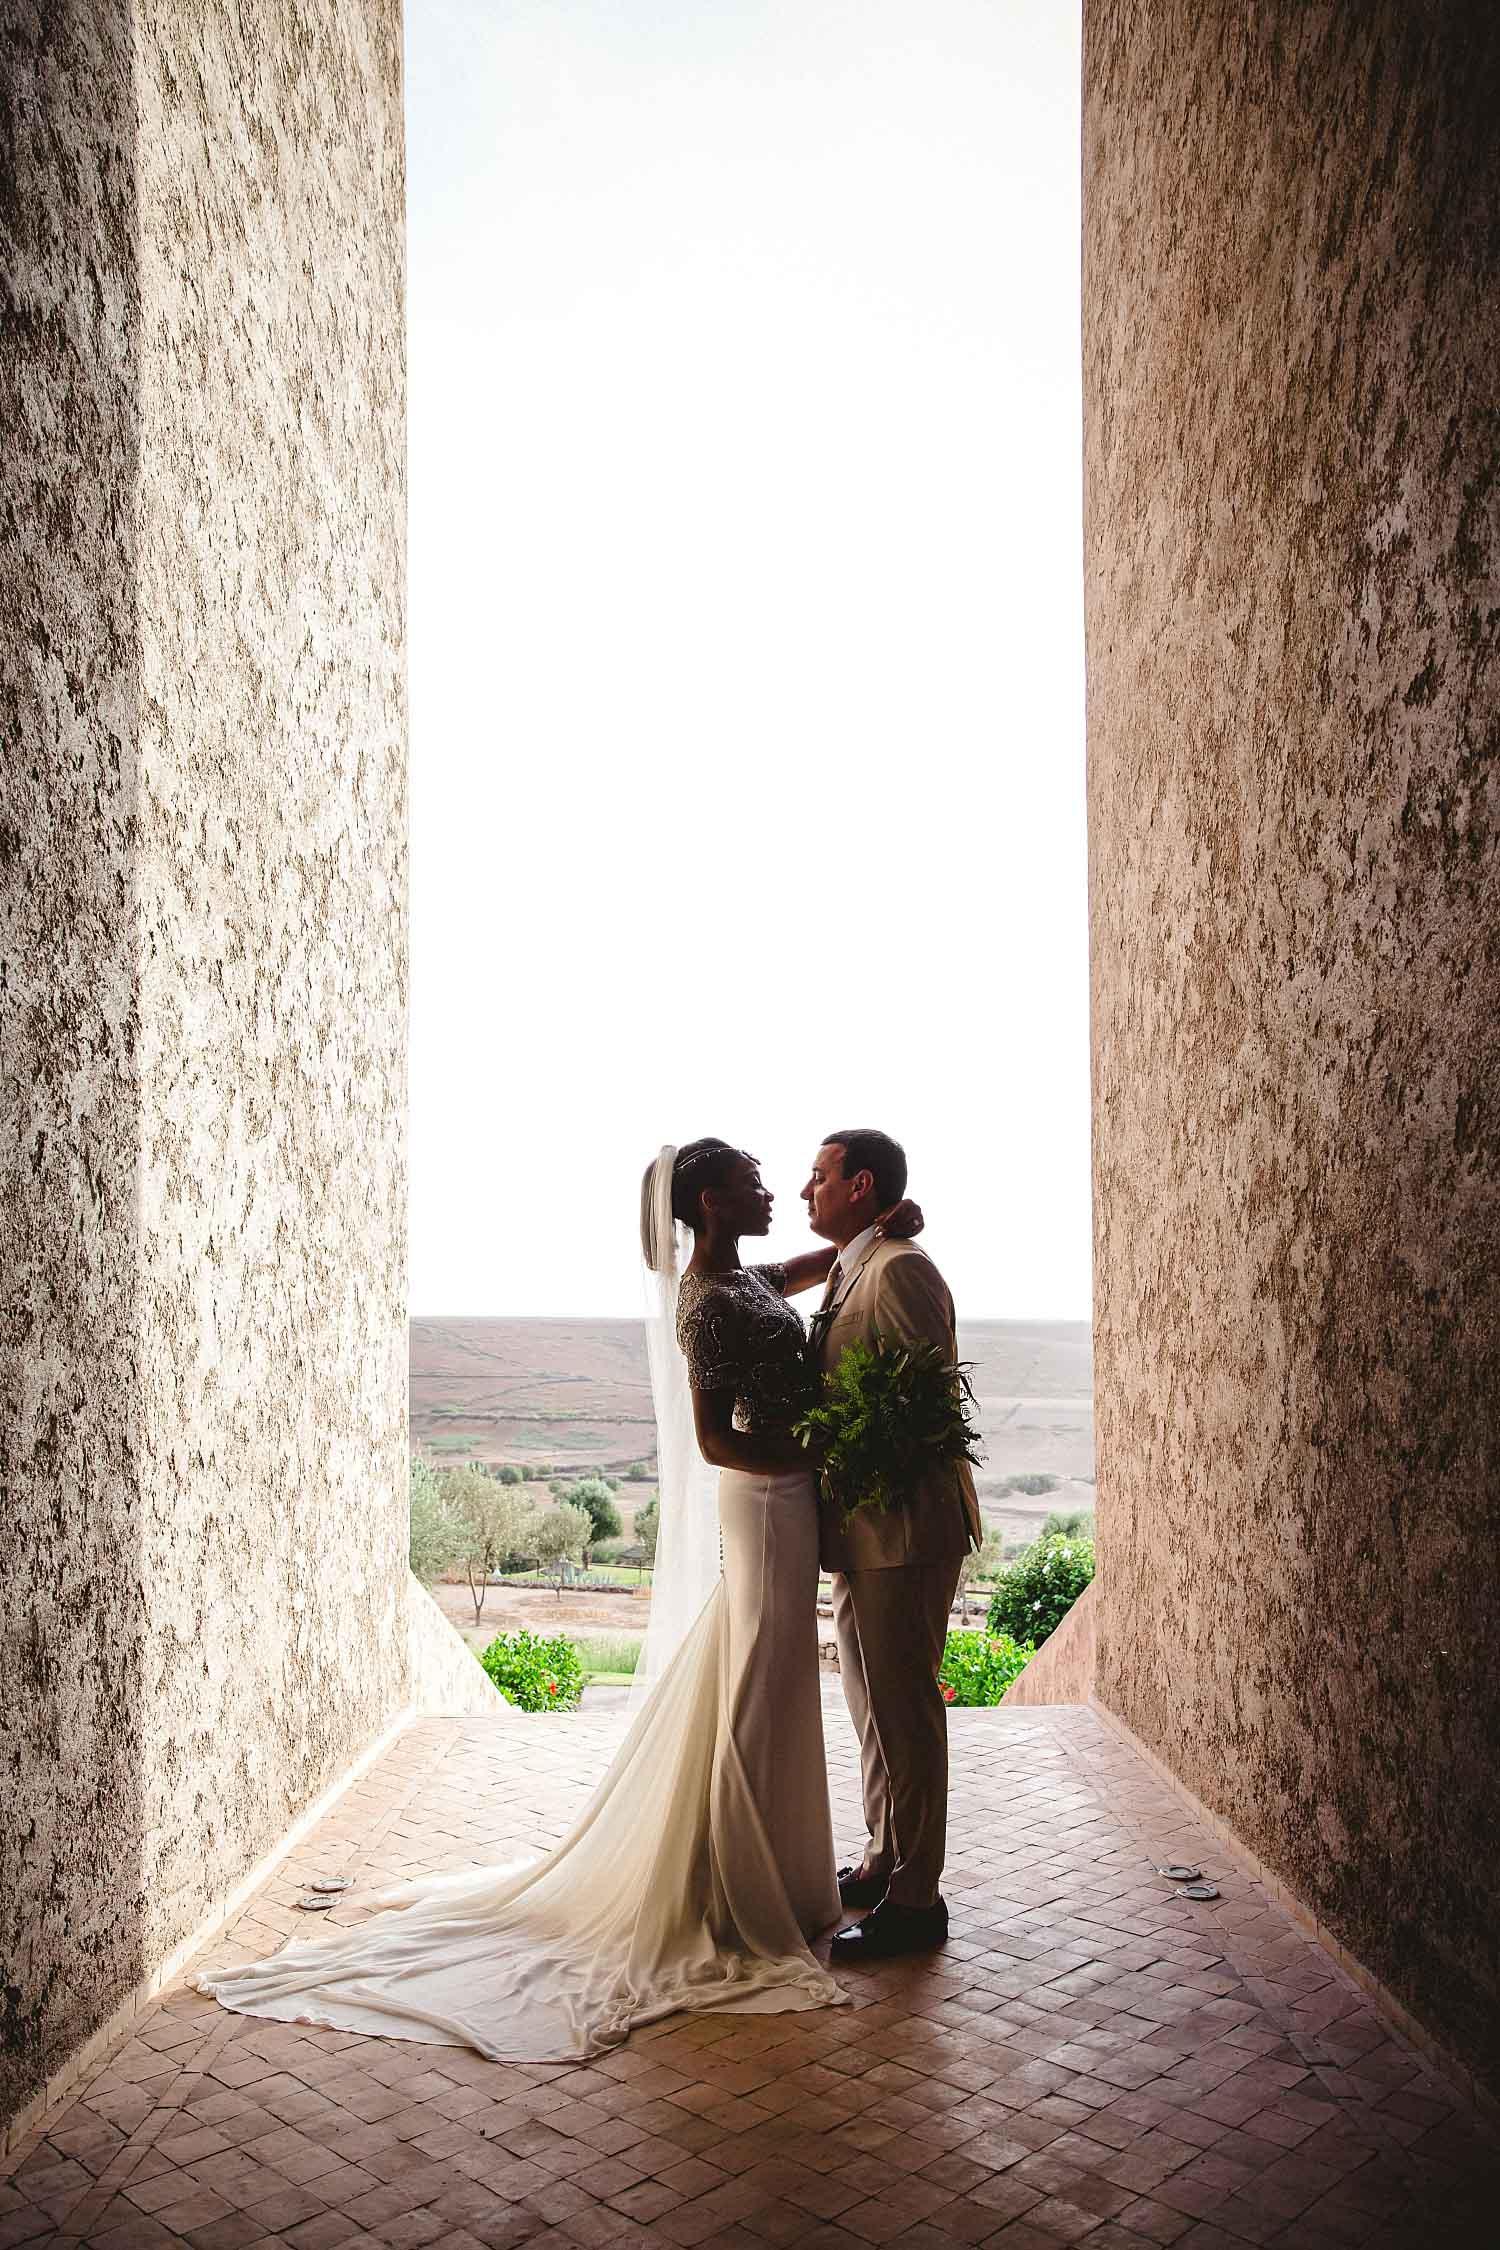 Le_Palais_Paysan_Morocco_Wedding_0064.jpg